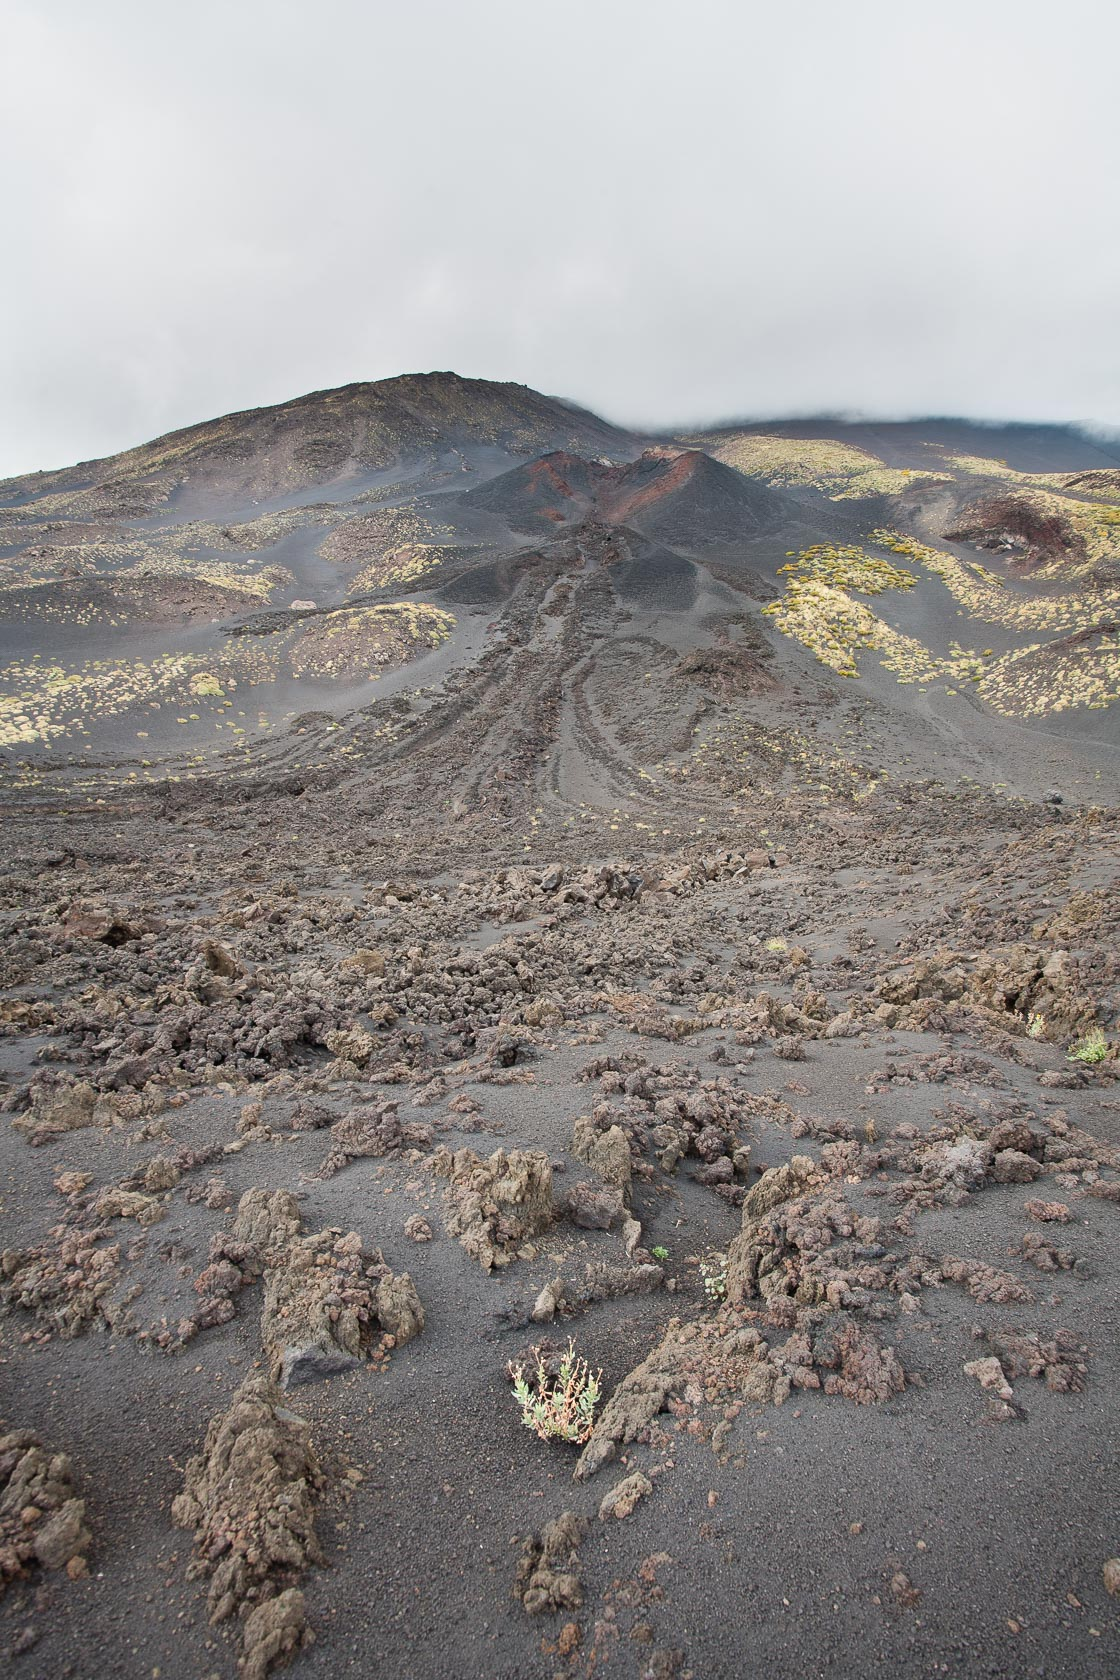 cône adventif sur le volcan Etna en Sicile